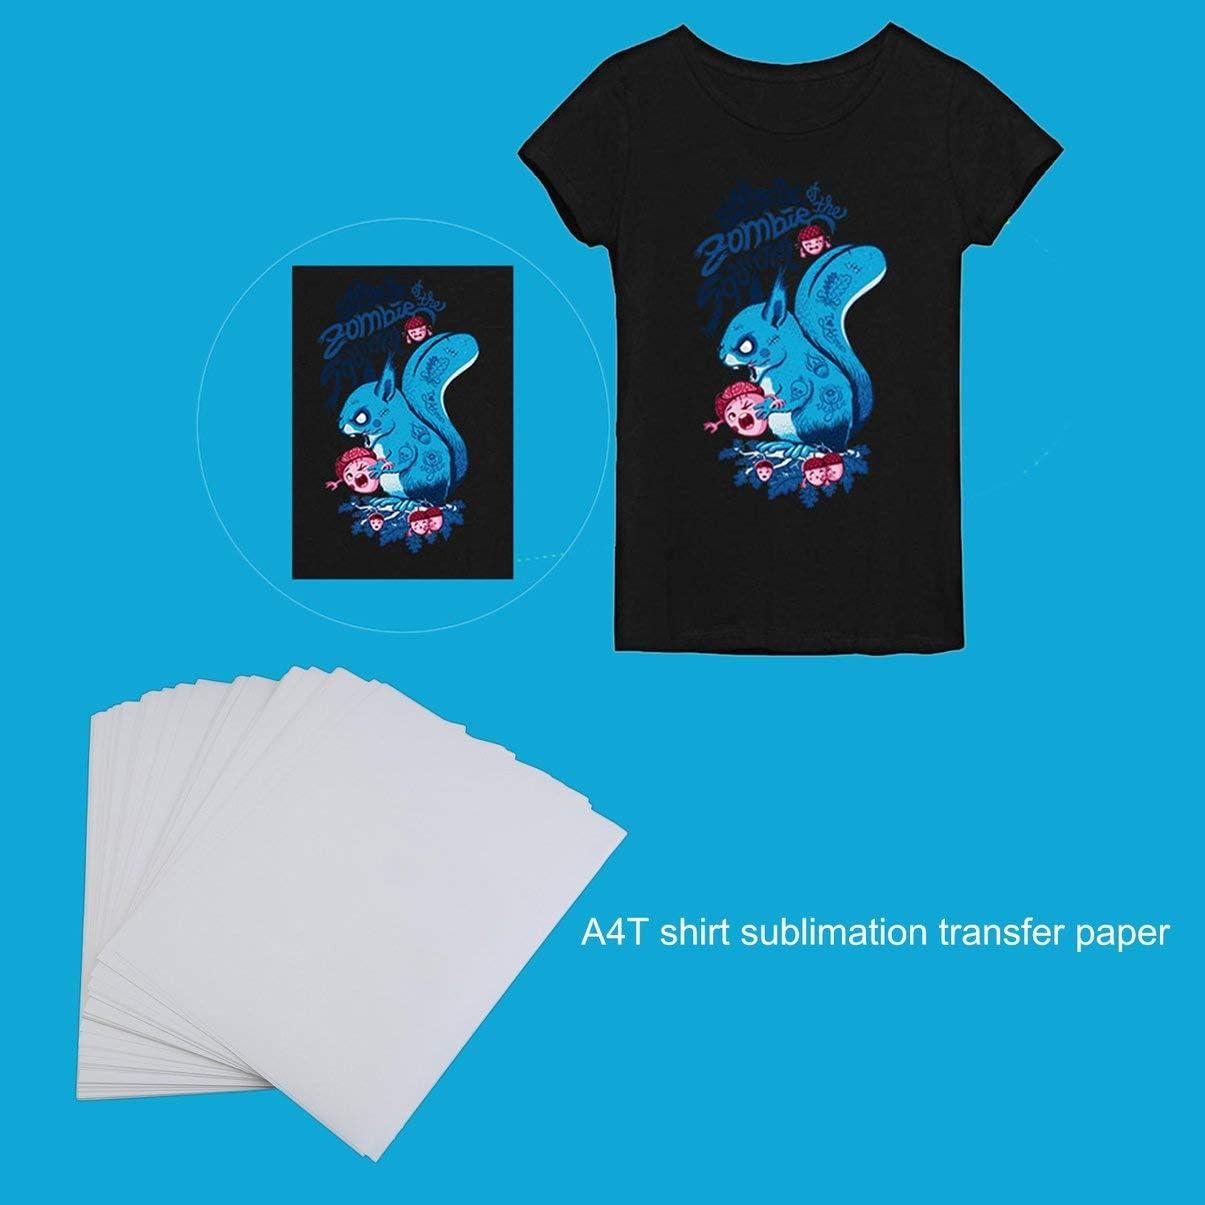 100 ST/ÜCKE A4 Sublimationsdruck Papier F/ür Polyester Baumwolle T-Shirt Aufb/ügeln Transferpapier W/ärmedruck Transfer Zubeh/ör